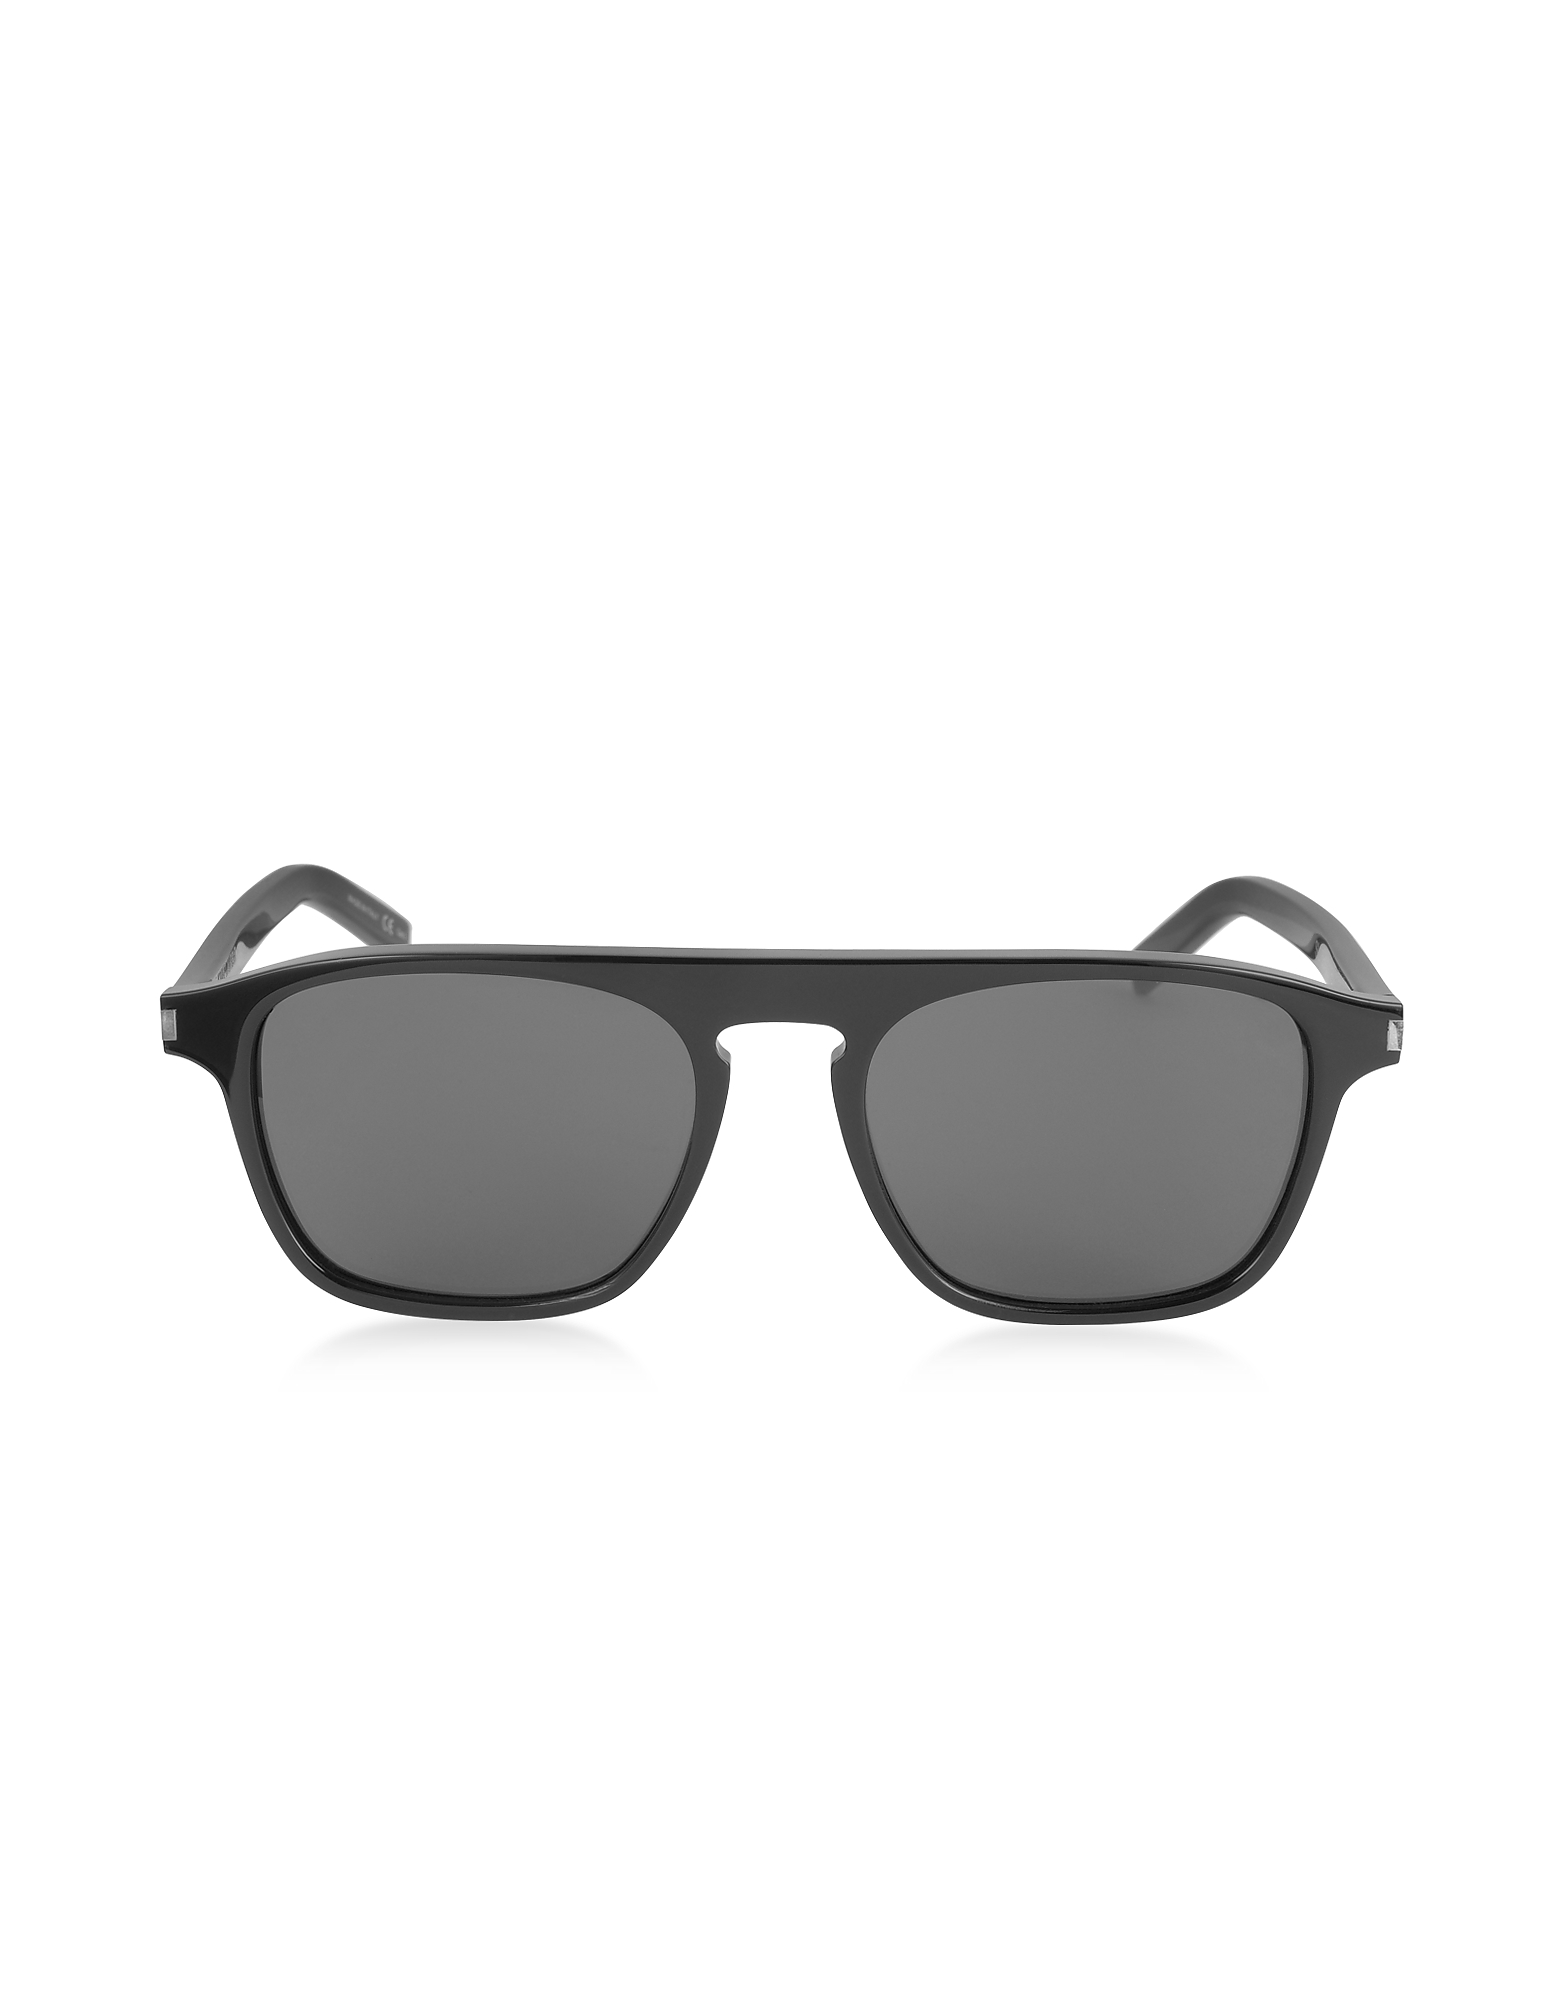 Saint Laurent Sunglasses, SL 158 Acetate Rectangle Frame Men's Sunglasses